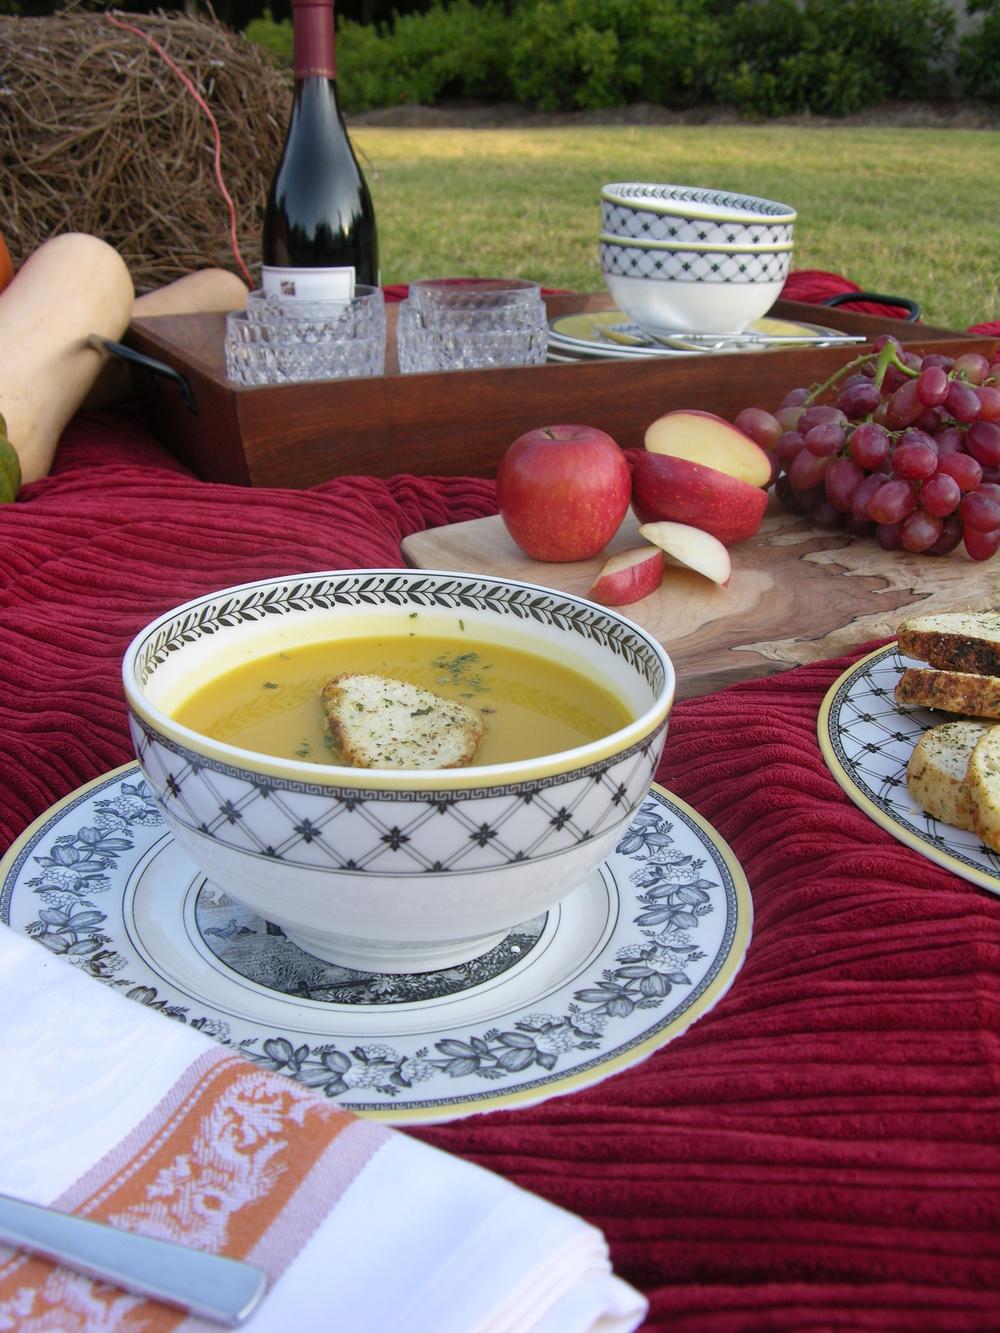 Roasted Butternut Squash soup recipe MartieDuncan.com